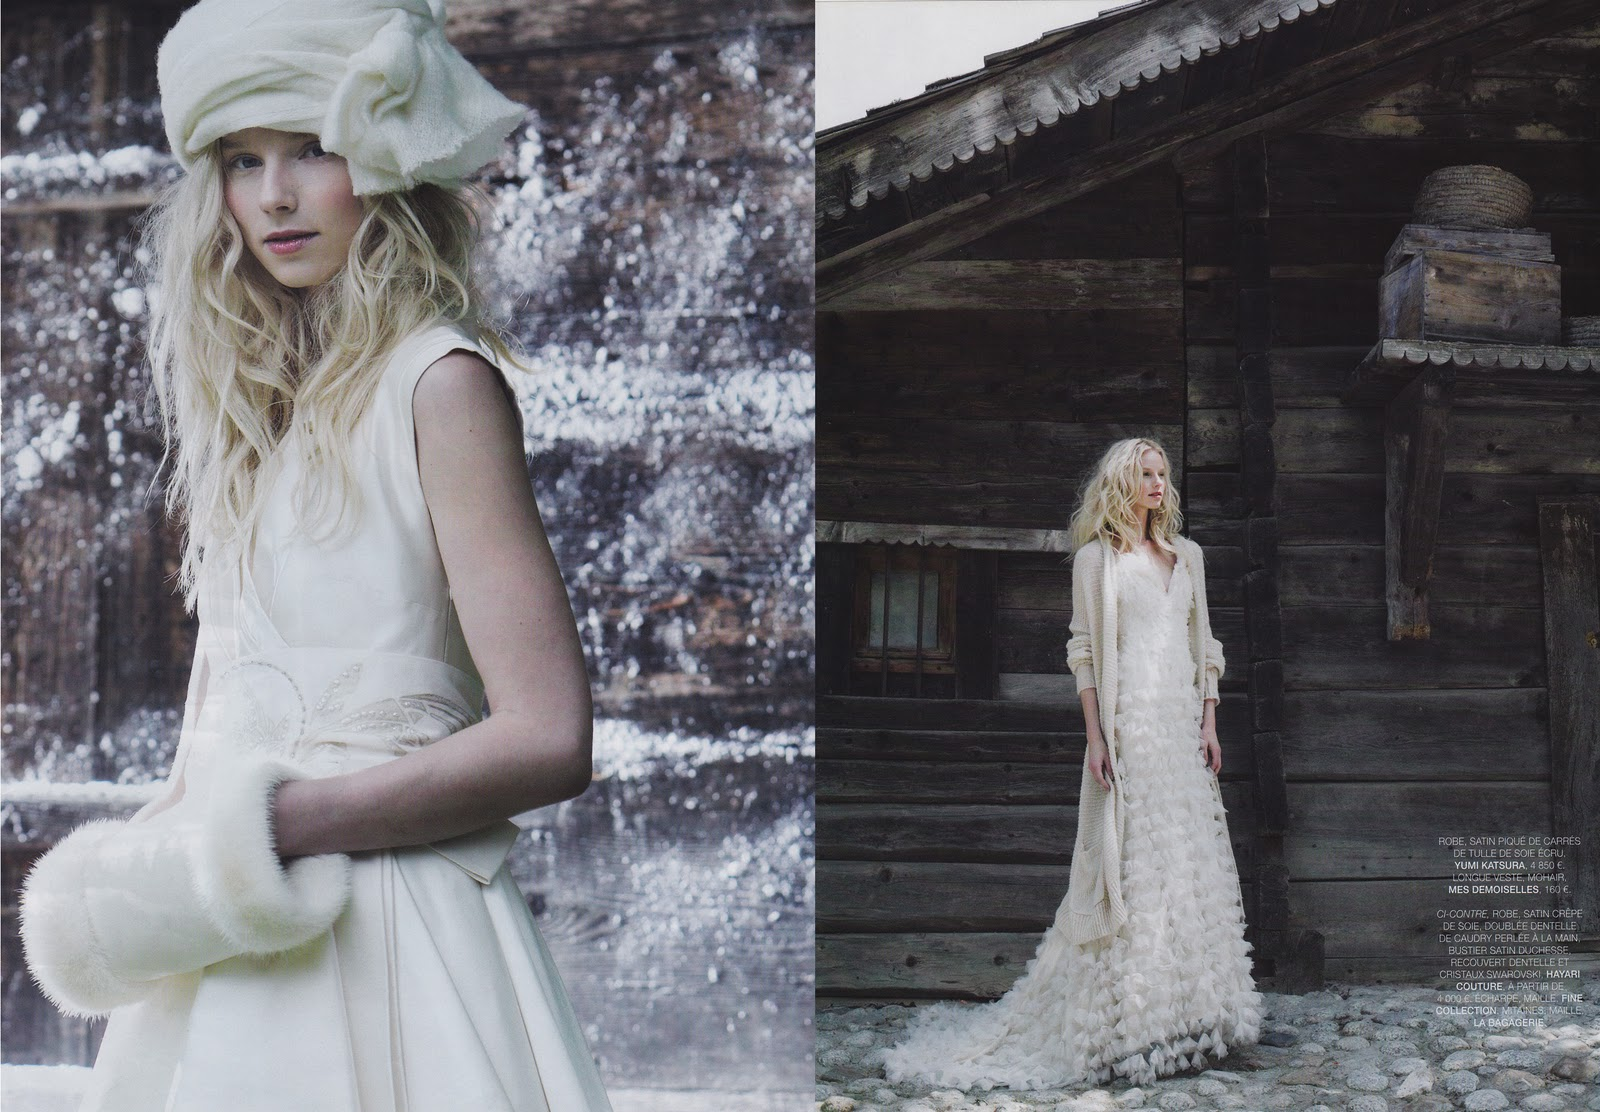 Seasonal Wedding Themes And Ideas- 4.Winter Wedding Ideas